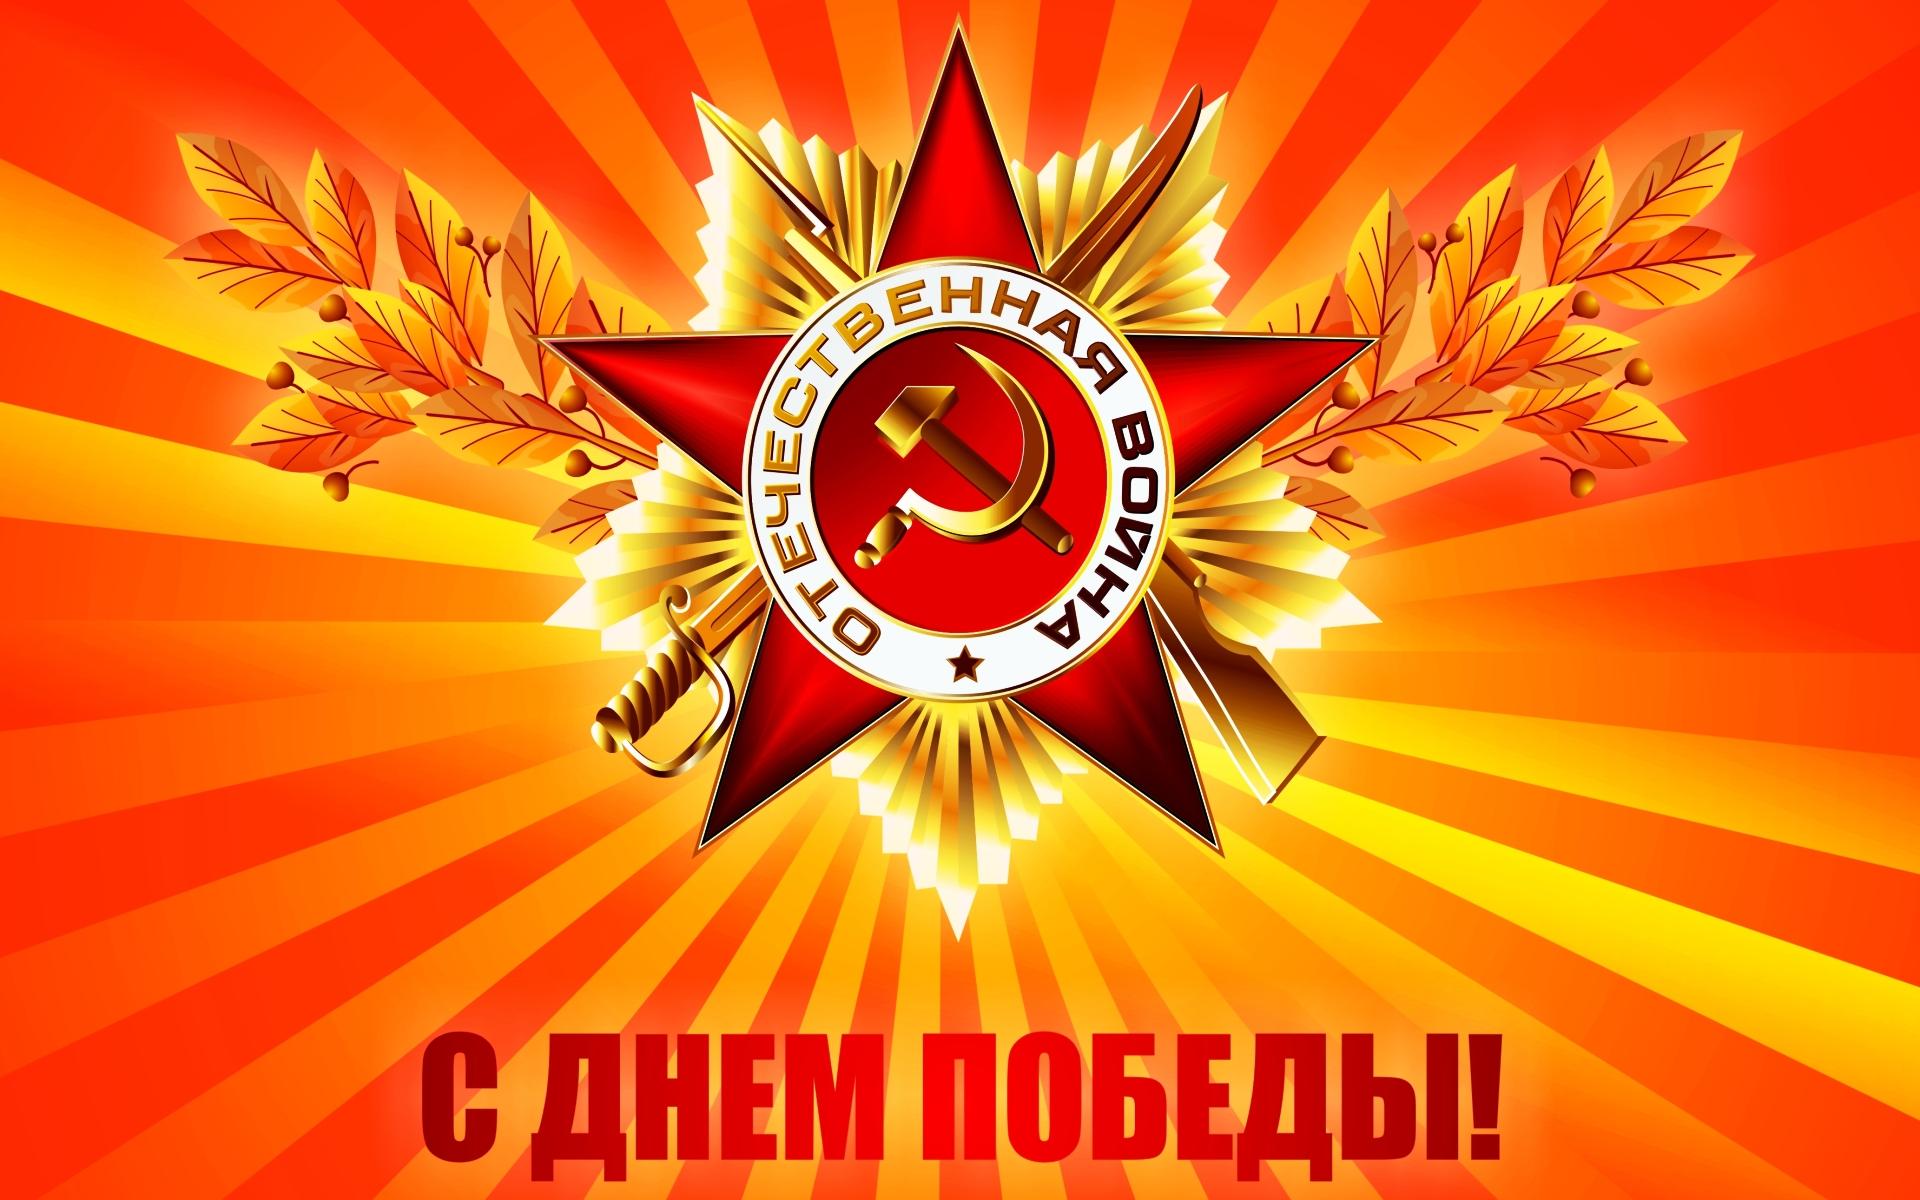 http://www.kartinki24.ru/uploads/gallery/main/260/kartinki24_ru_9th_may_39.jpg